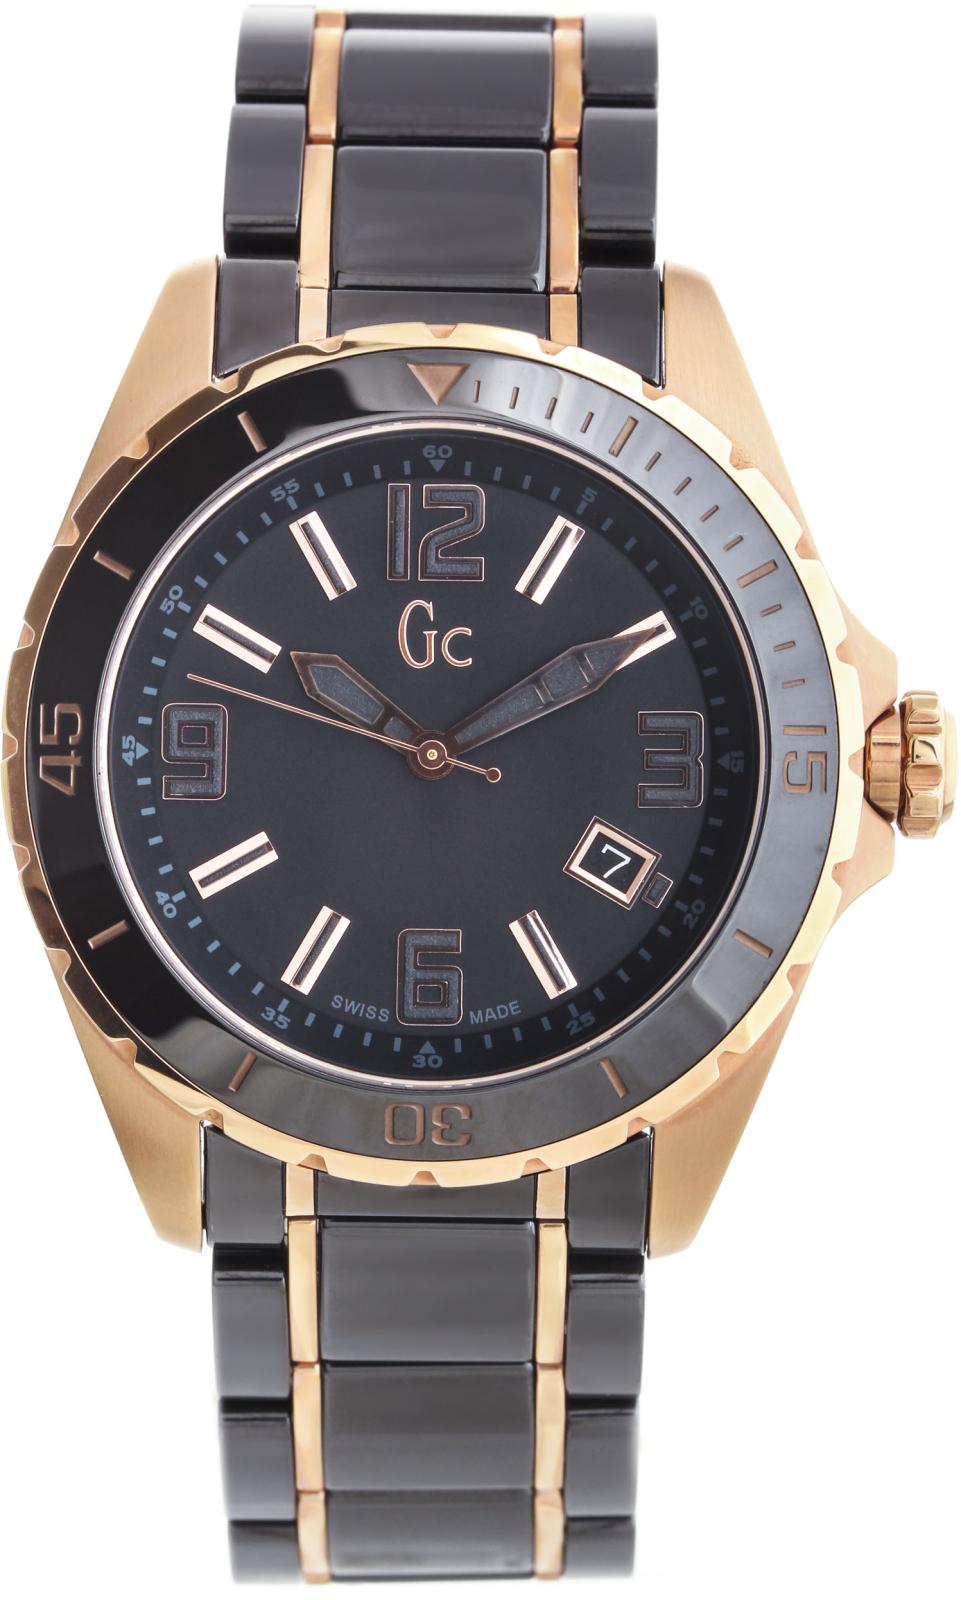 GC Sport Chic X85011G2SНаручные часы<br>Швейцарские часы GC Sport Chic X85011G2S<br><br>Пол: Мужские<br>Страна-производитель: Швейцария<br>Механизм: Кварцевый<br>Материал корпуса: Золото+сталь<br>Материал ремня/браслета: Сталь+керамика<br>Водозащита, диапазон: 100 - 150 м<br>Стекло: Сапфировое<br>Толщина корпуса: None<br>Стиль: Классика